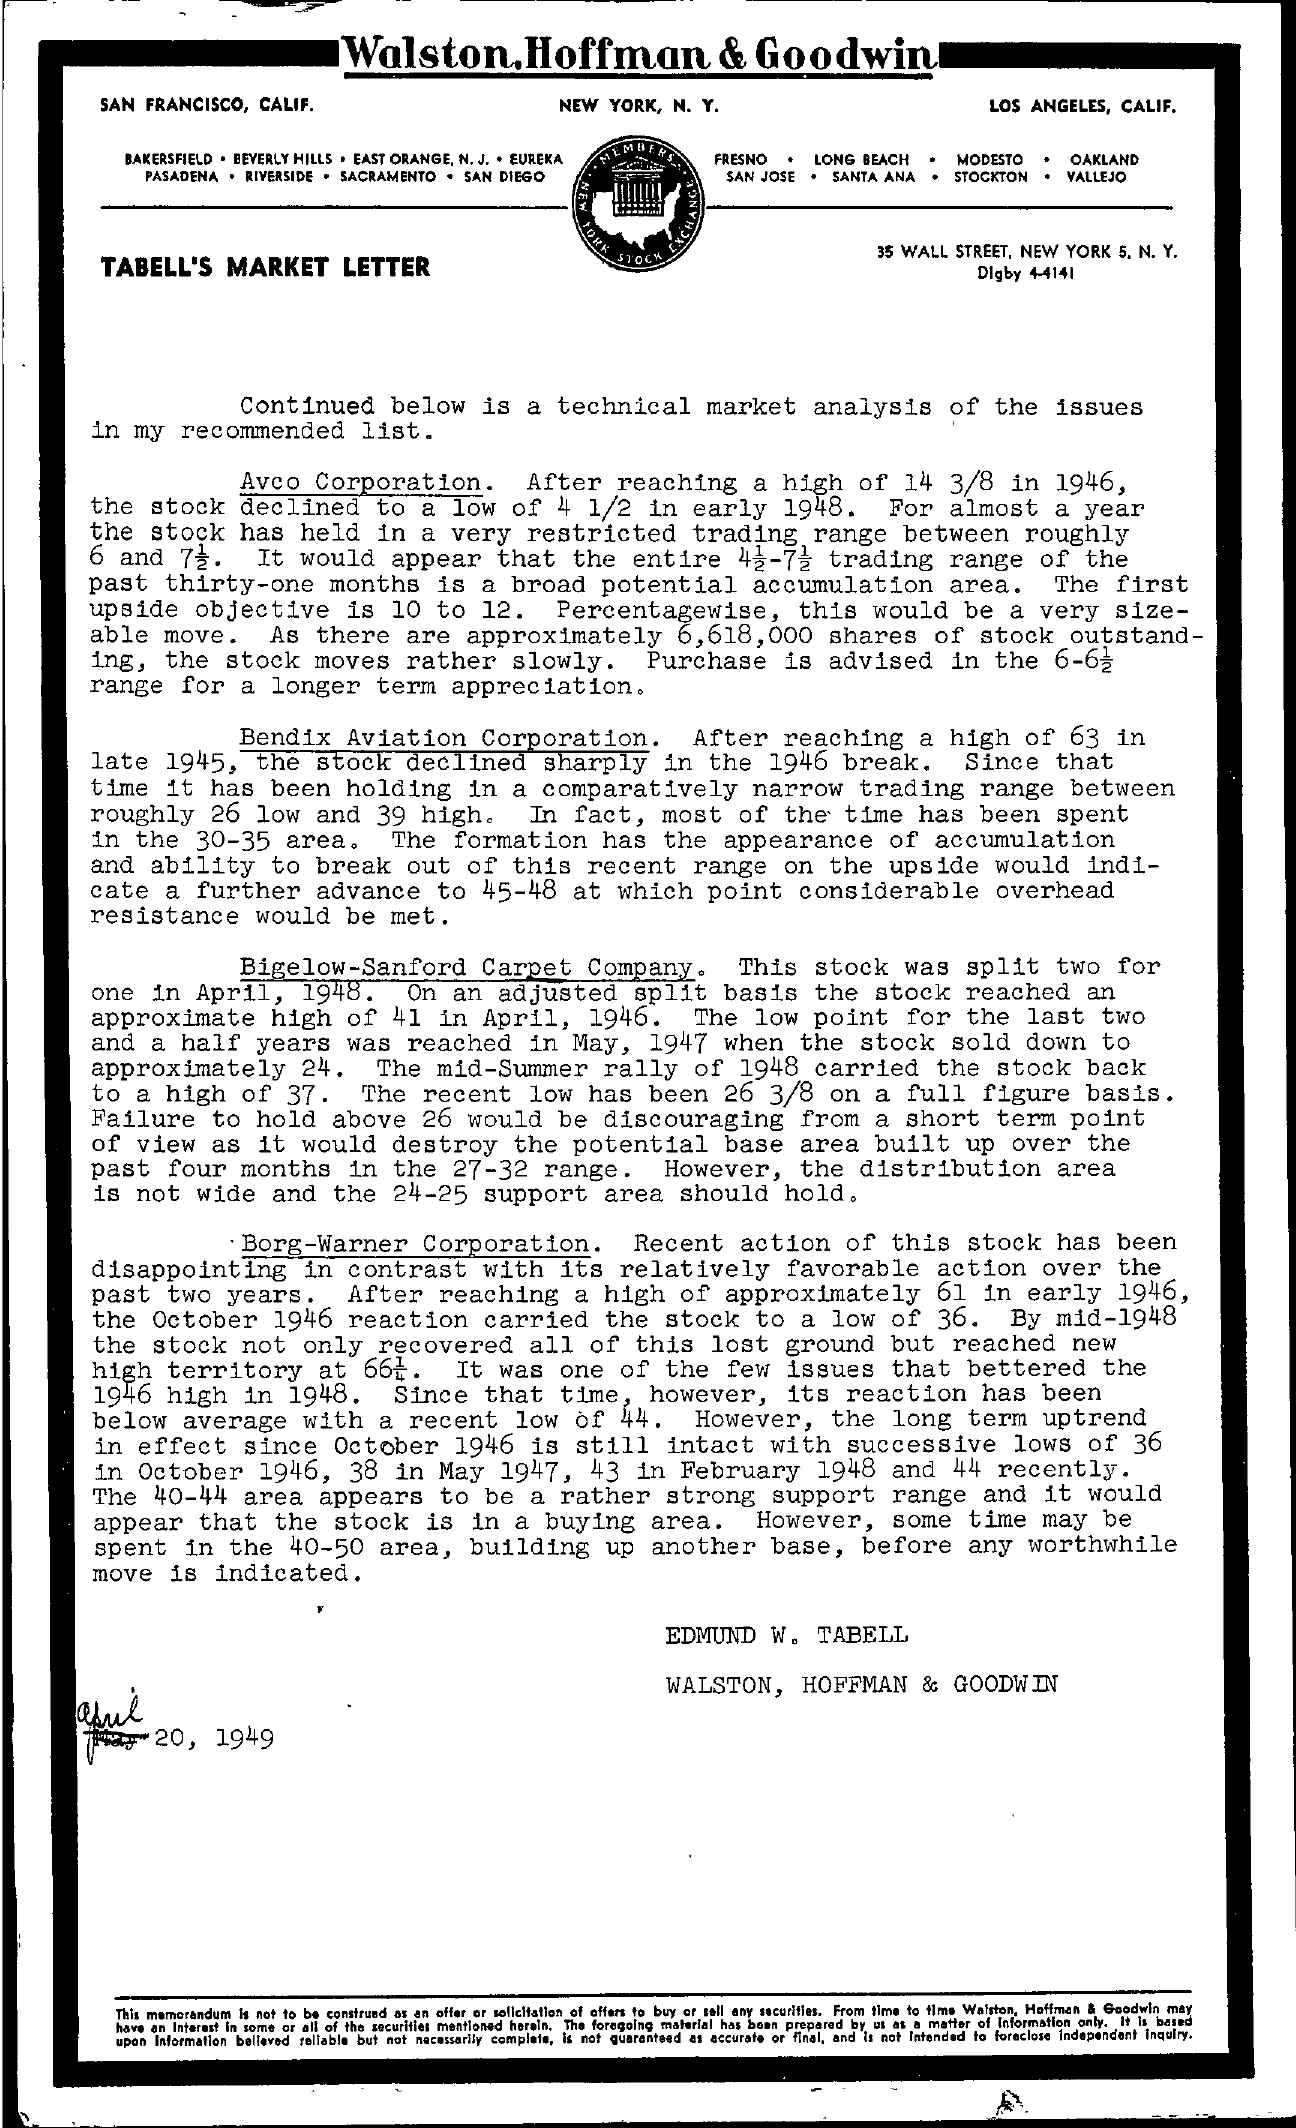 Tabell's Market Letter - April 20, 1949